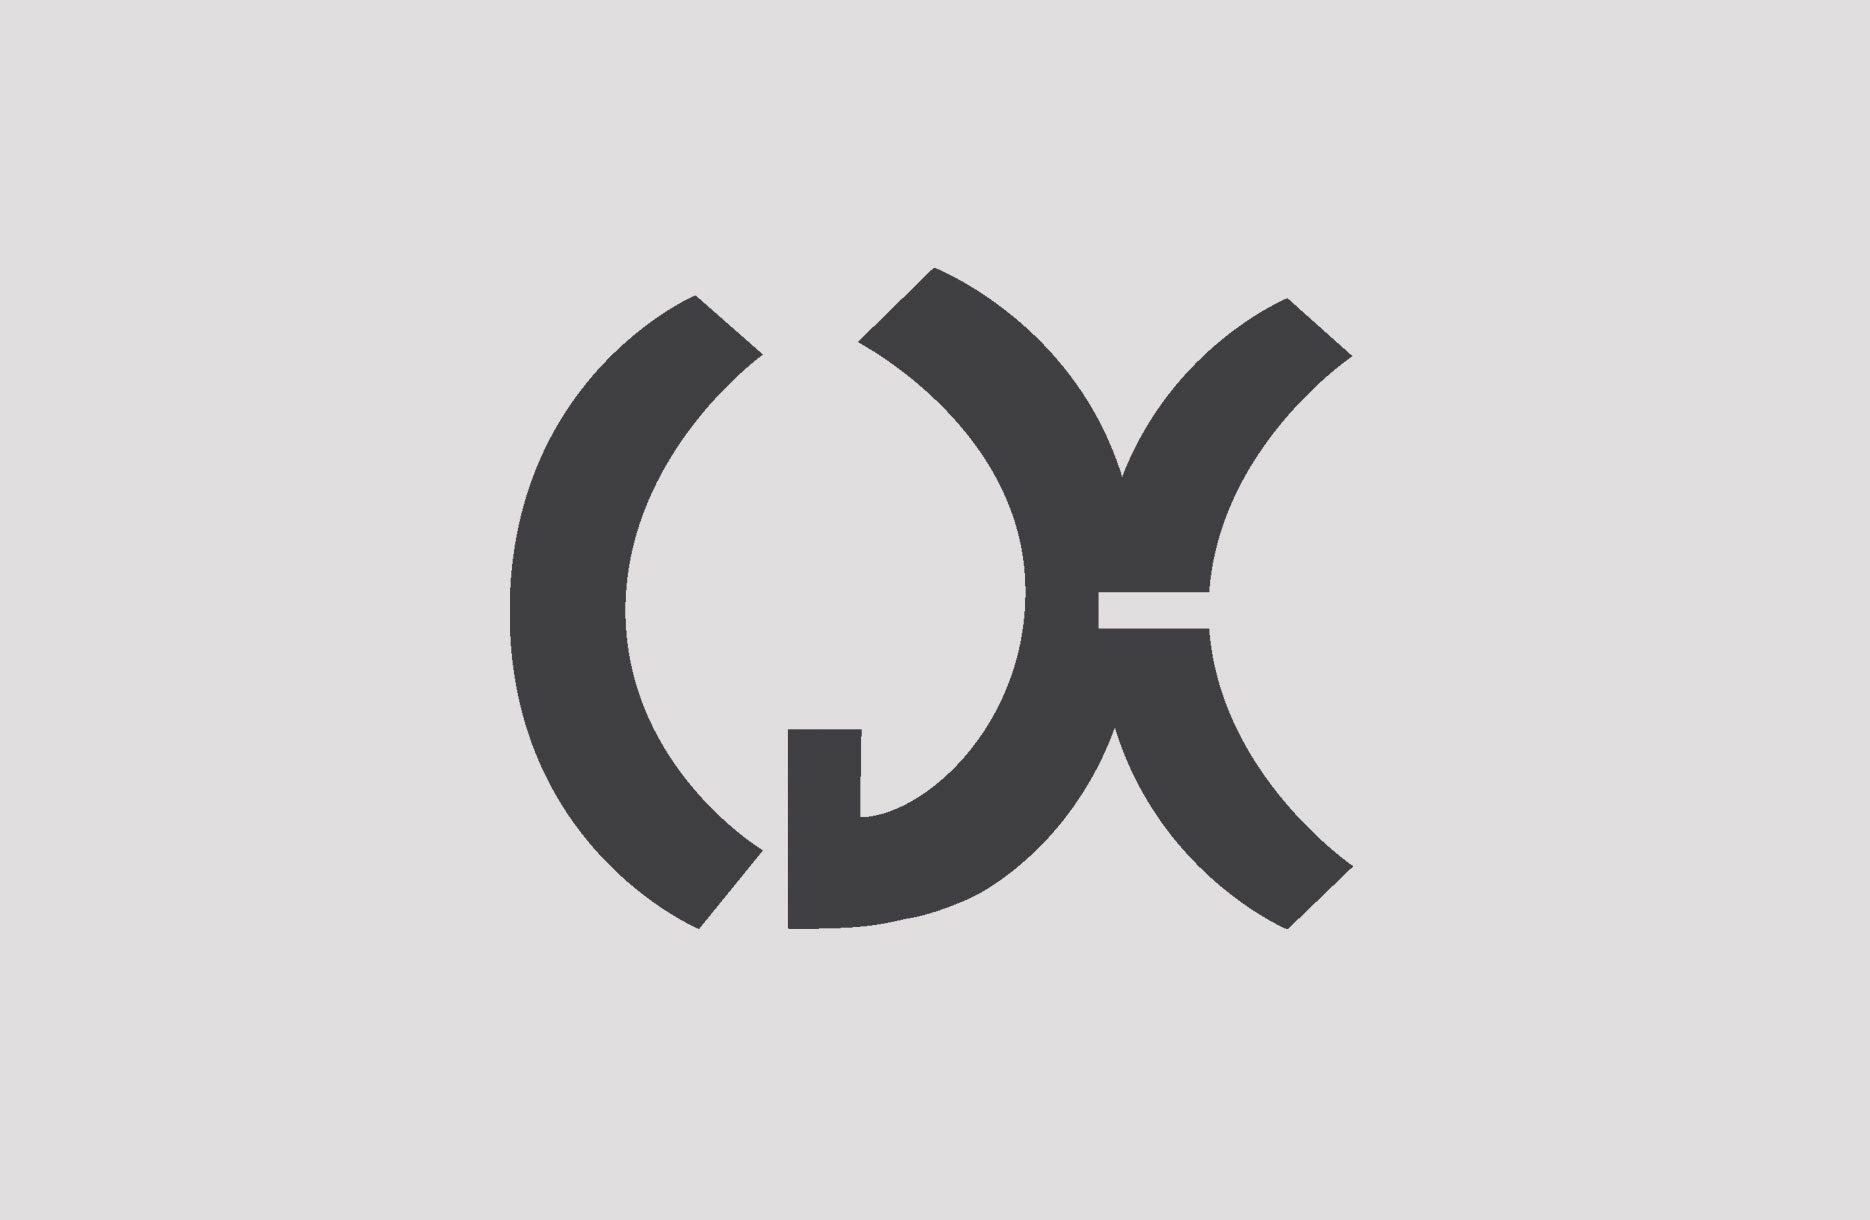 Designentwicklung des Logos